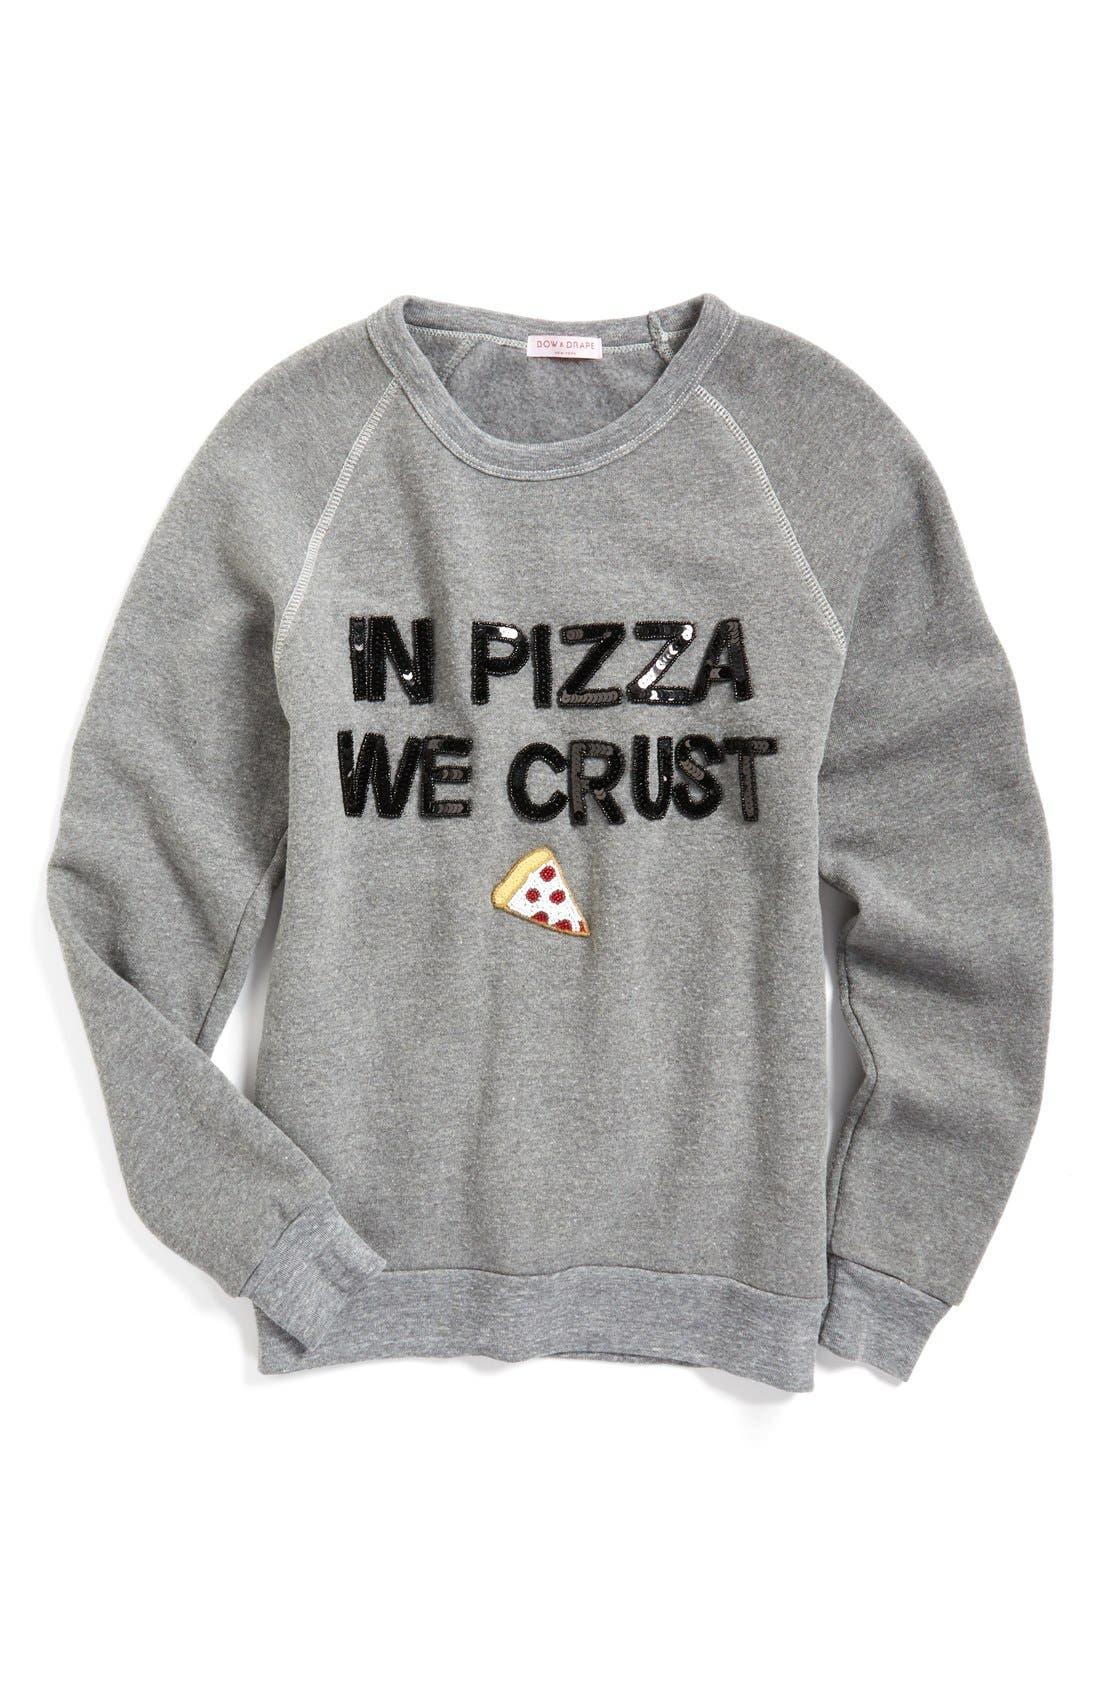 Main Image - Bow & Drape In Pizza We Crust Sweatshirt